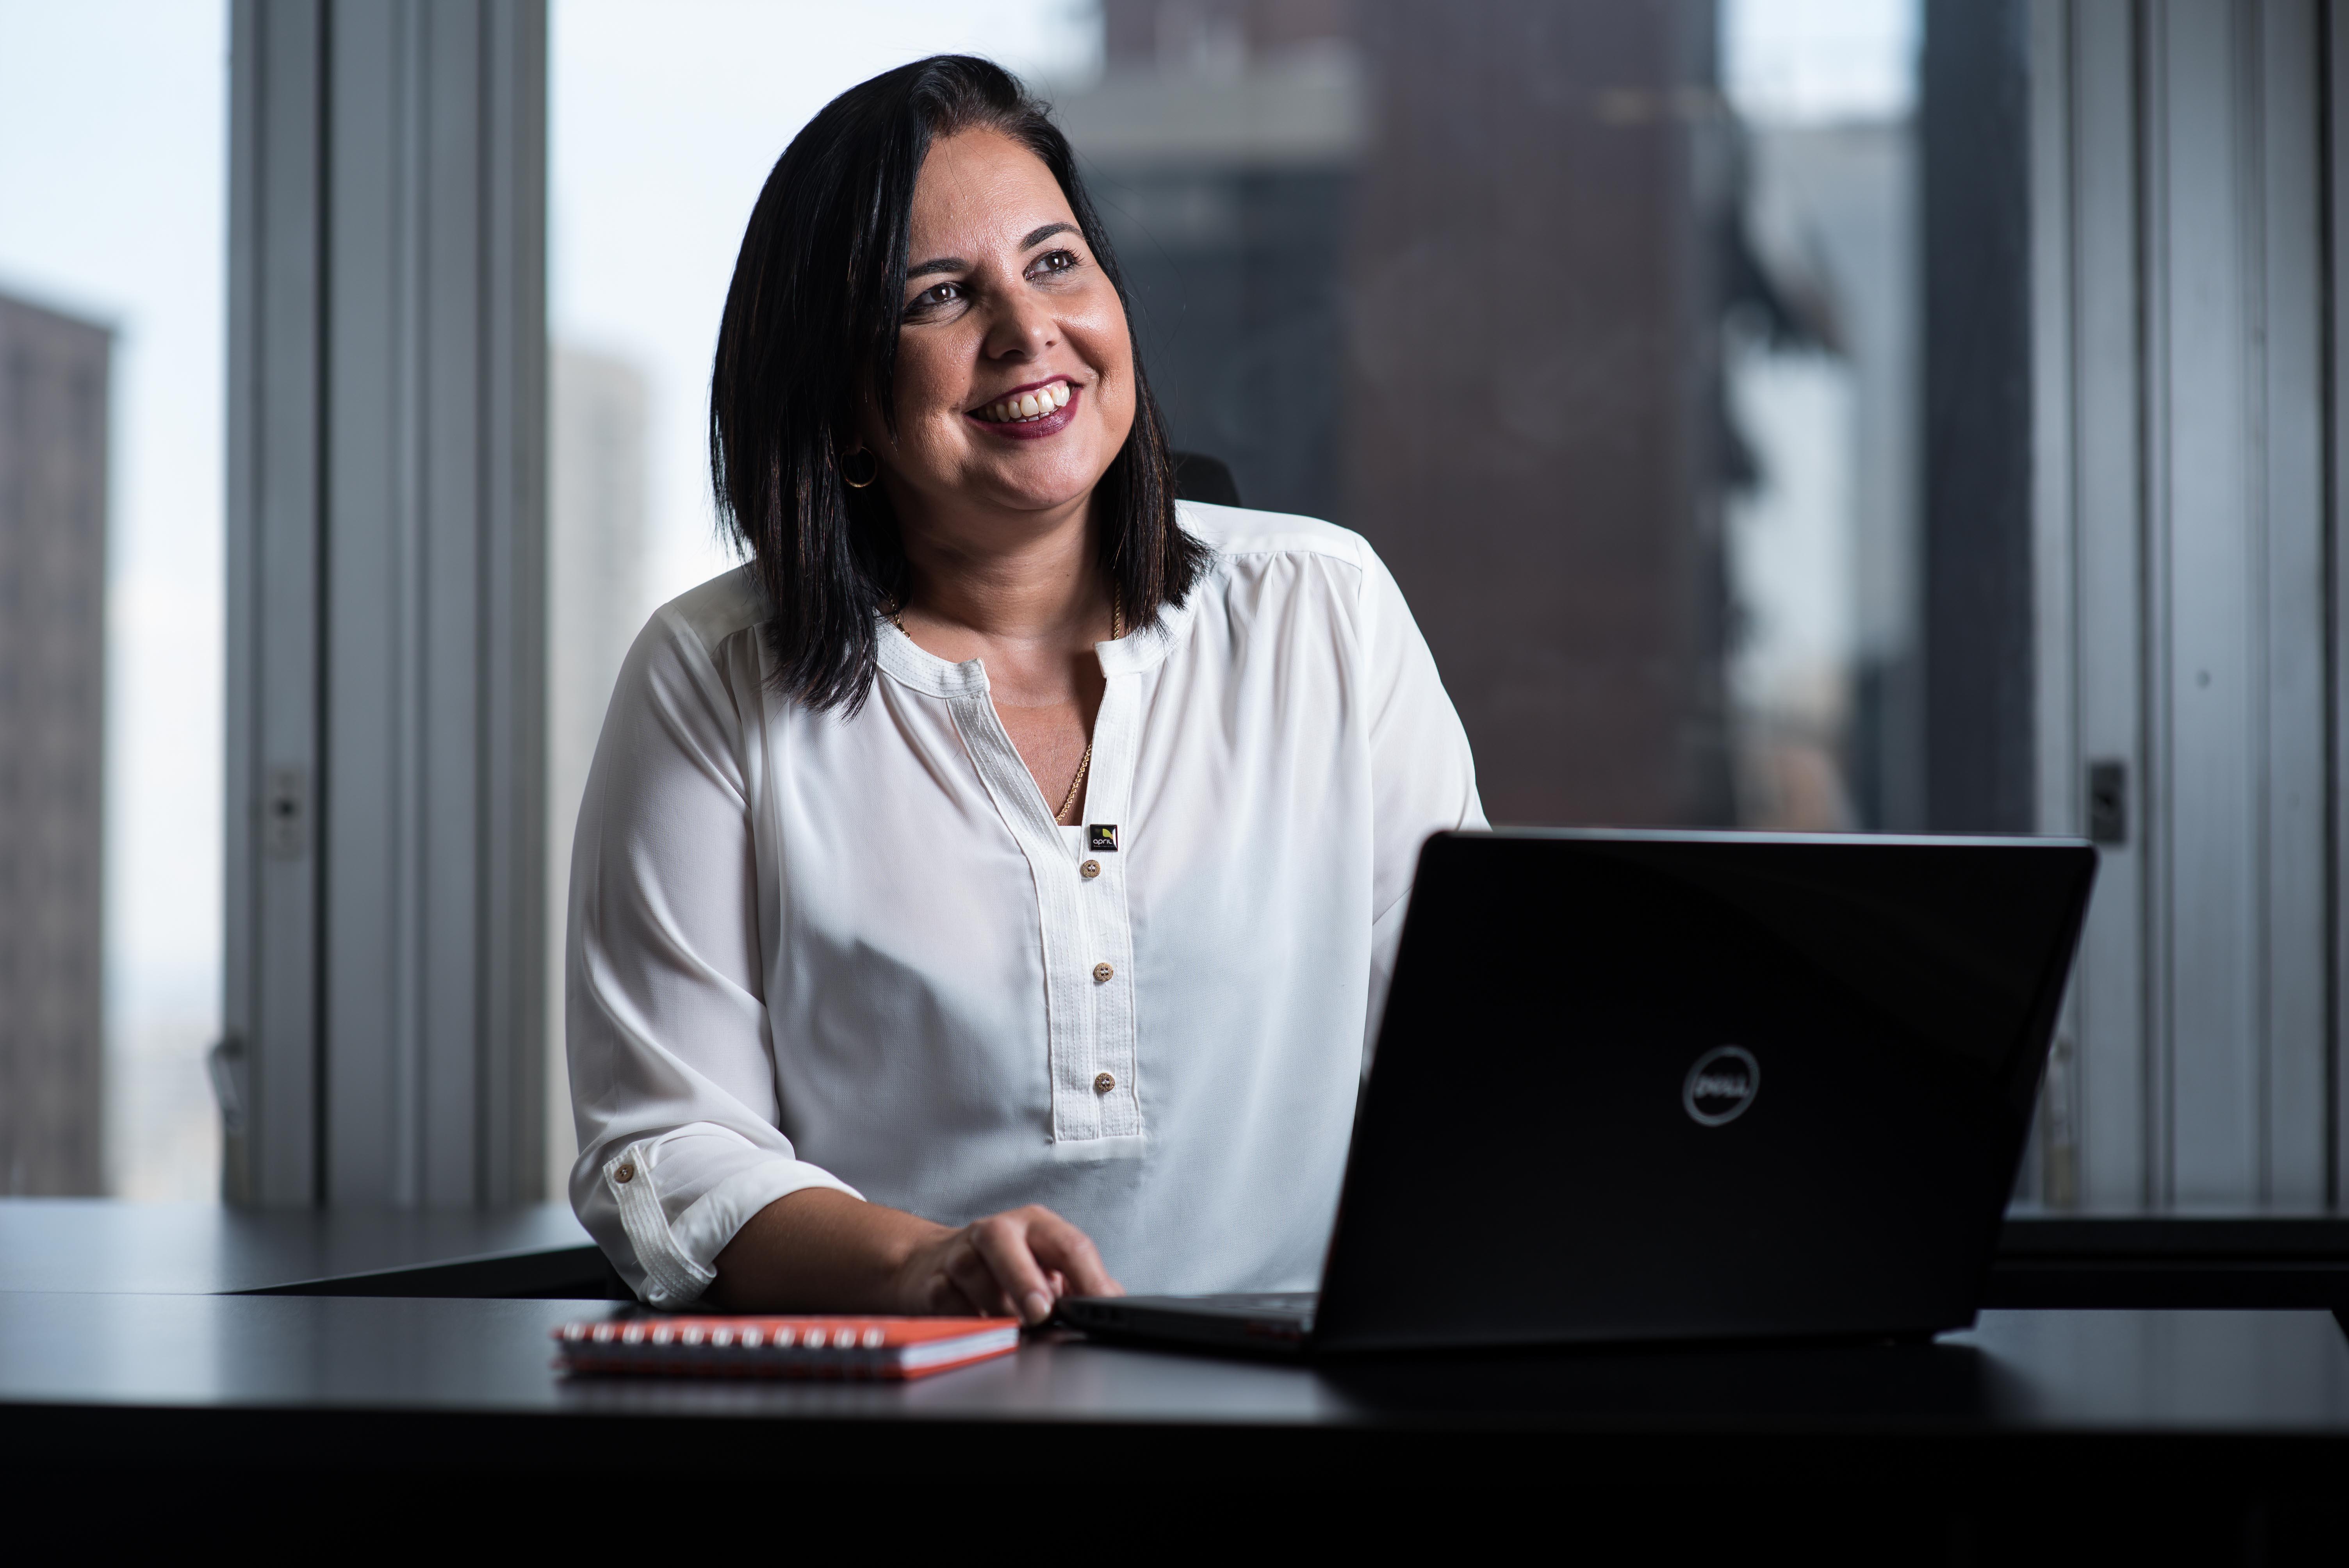 Claudia Brito, Gerente Comercial Nacional da April Brasil